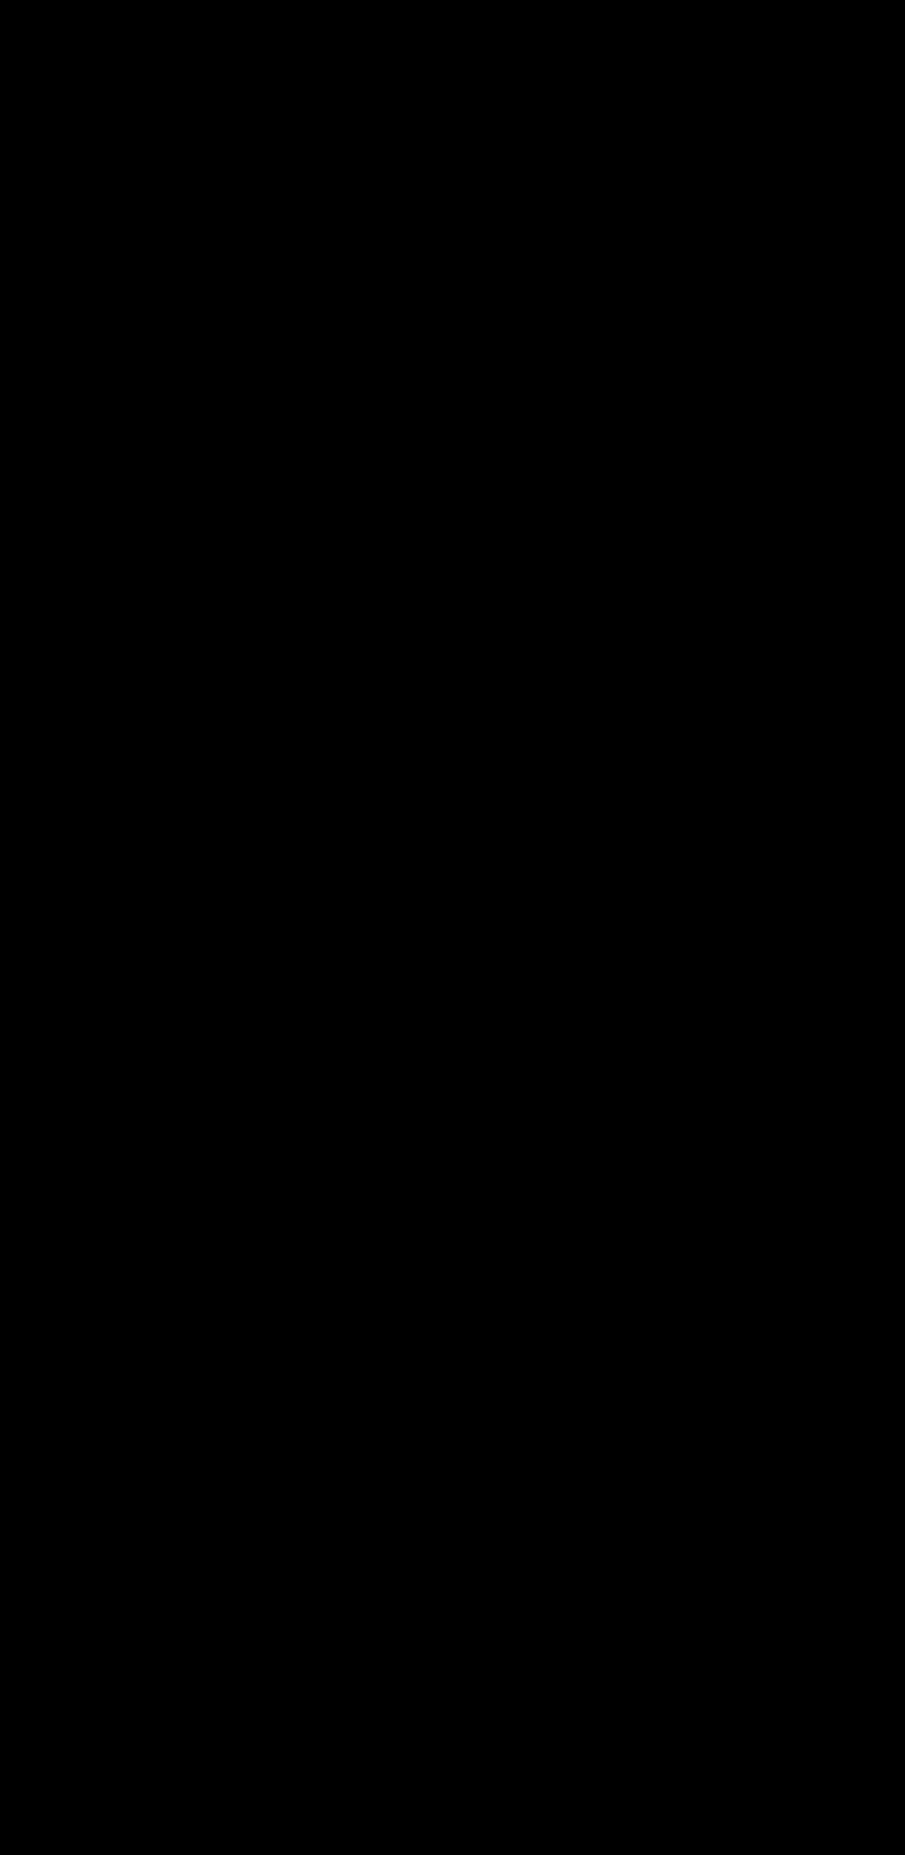 Download Transparent Rainbow Six Siege Logo By Jmk ...